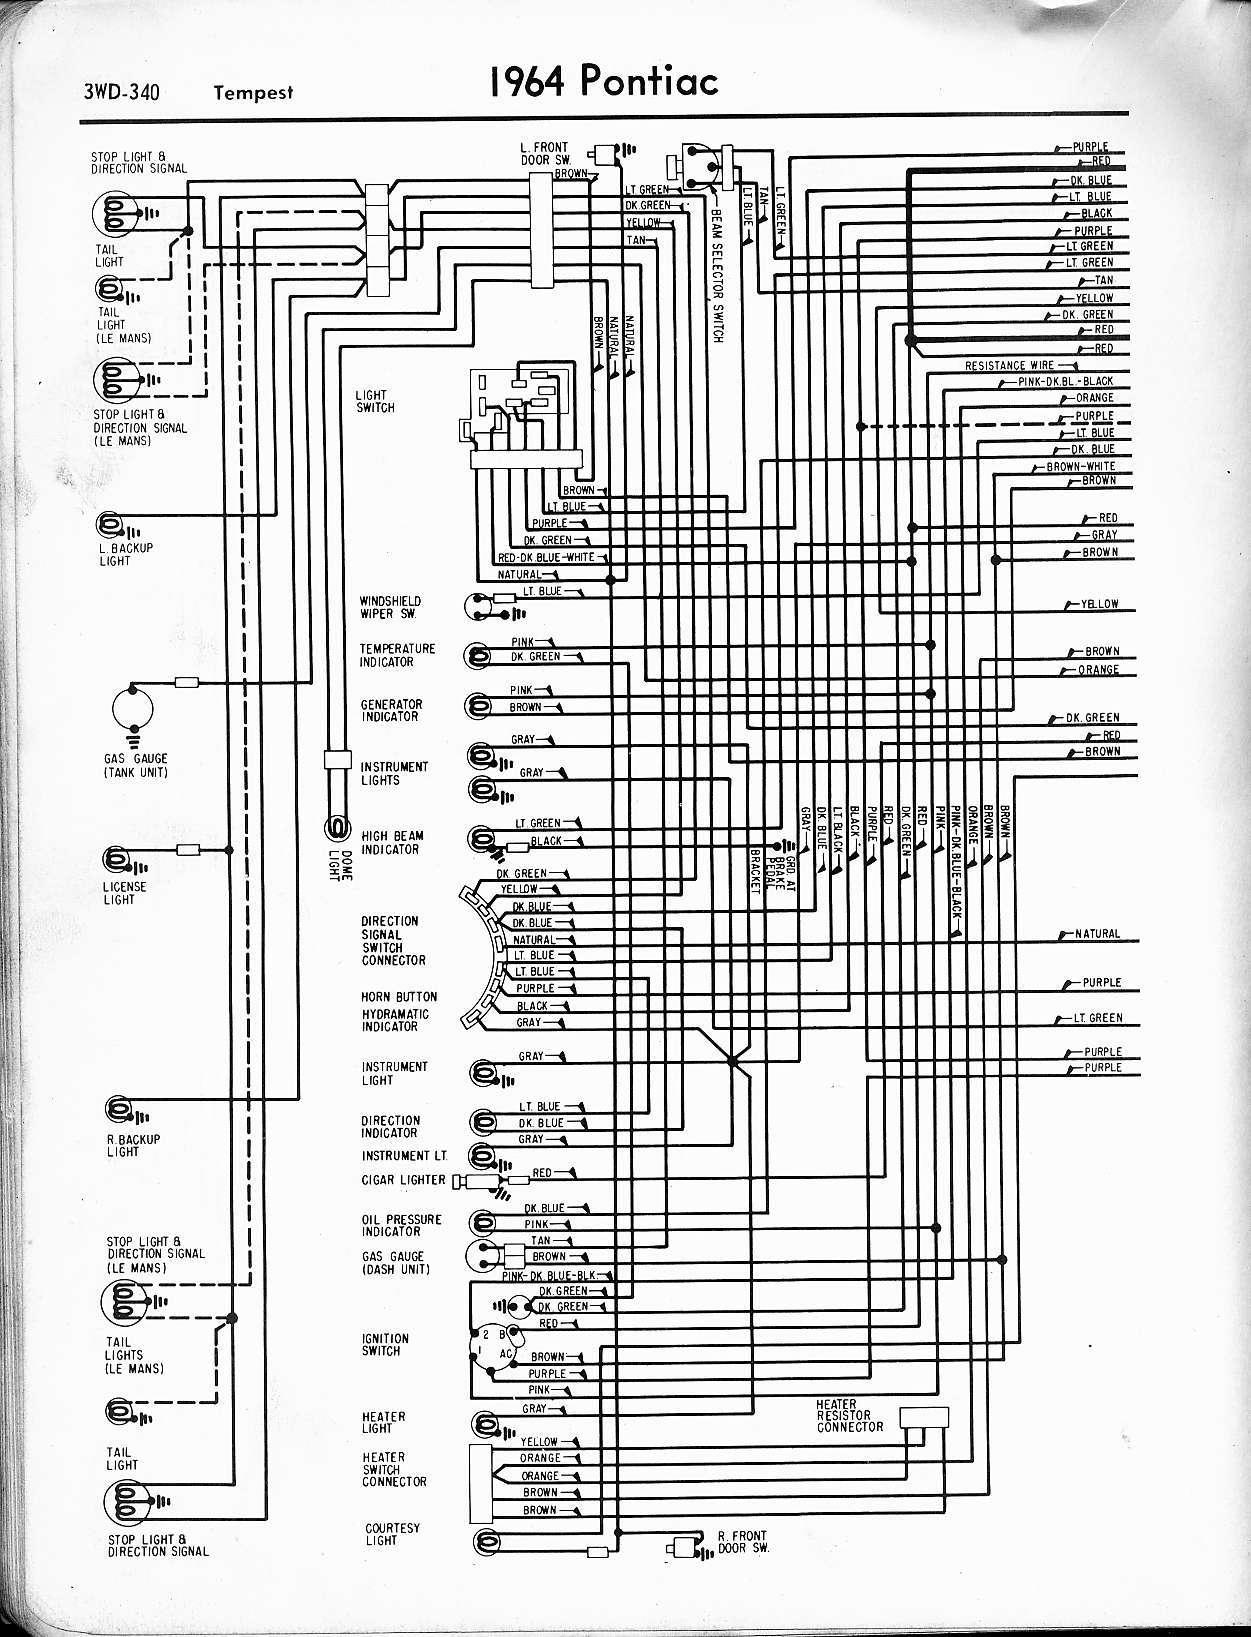 ka_2998] pontiac firebird wiring diagram get free image about wiring diagram  download diagram  jidig kapemie mohammedshrine librar wiring 101